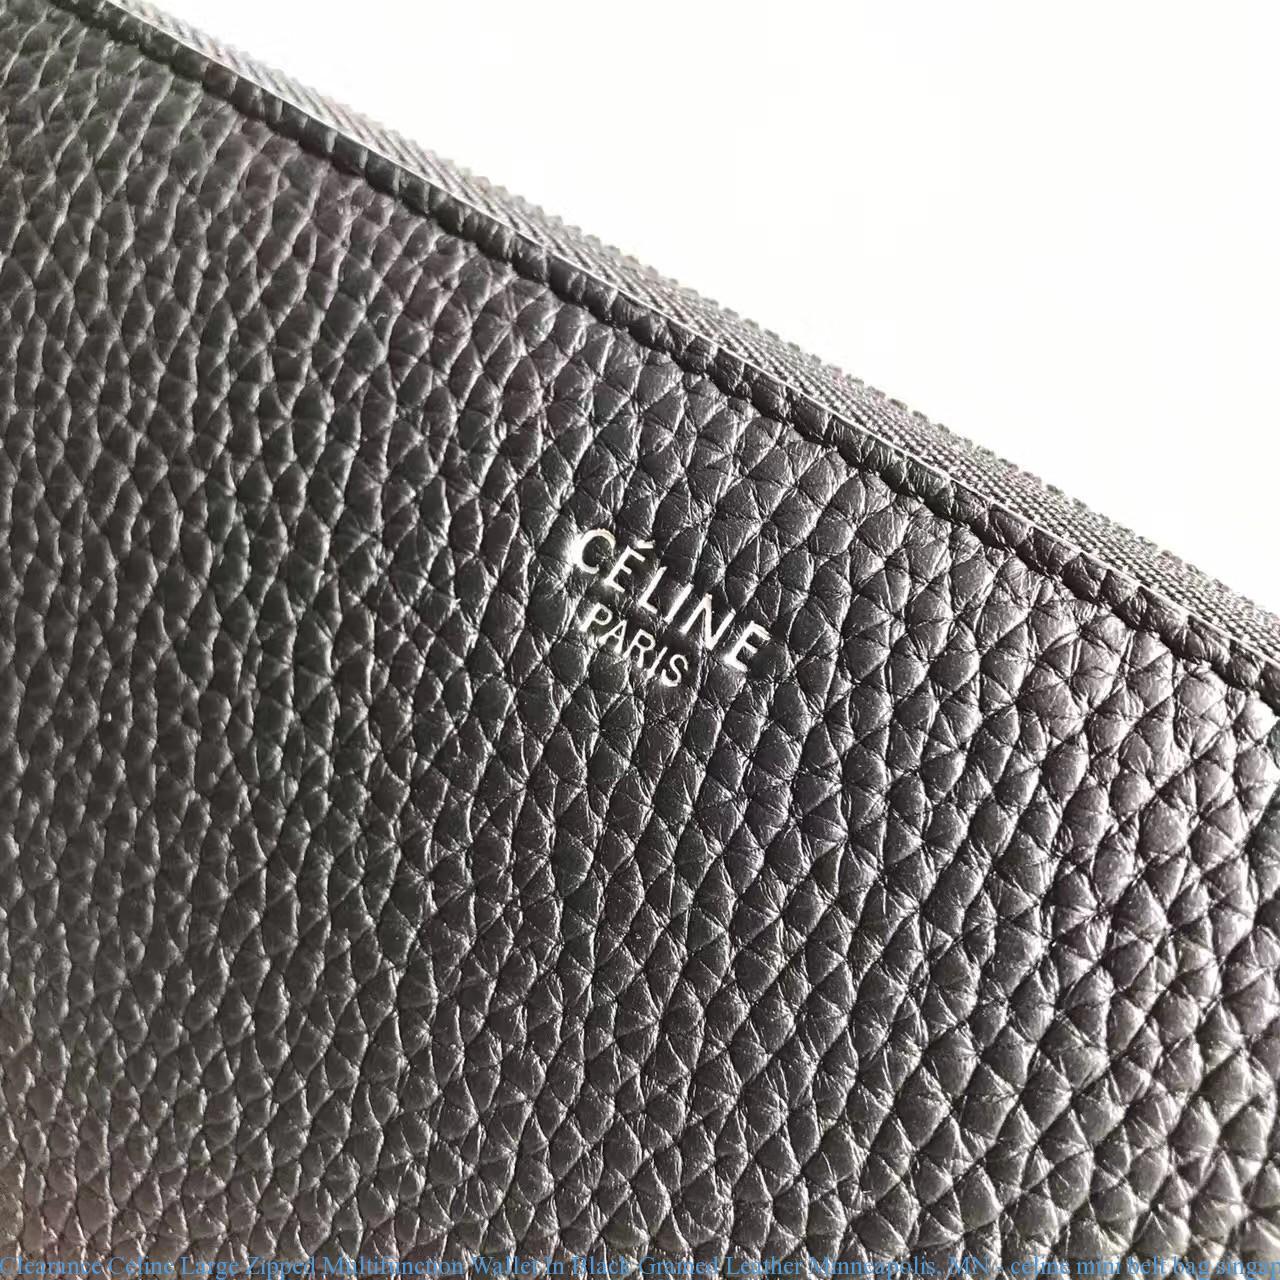 3cfbdac3ea7d Clearance Celine Large Zipped Multifunction Wallet In Black Grained ...